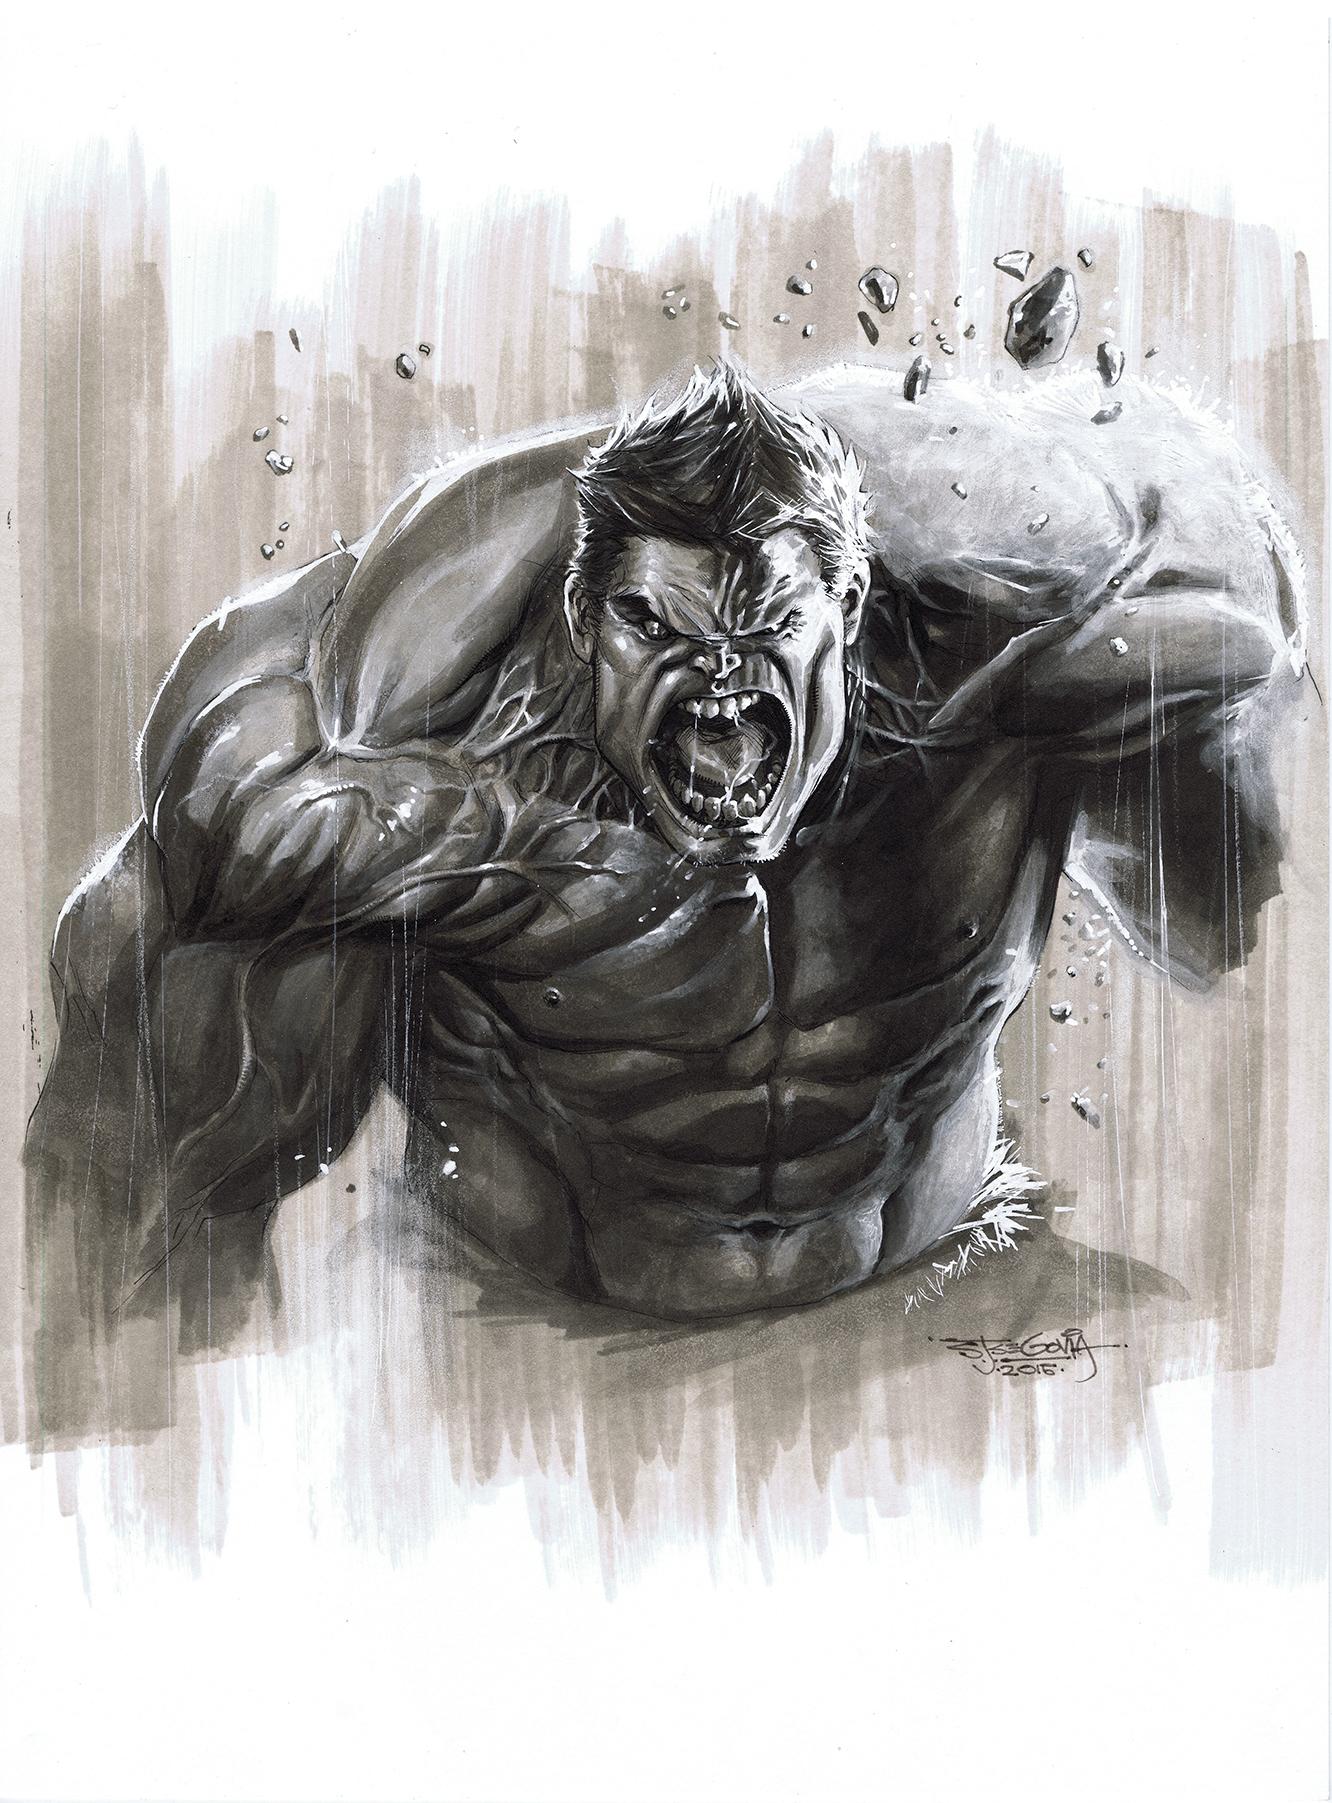 Hulk_copics.jpg